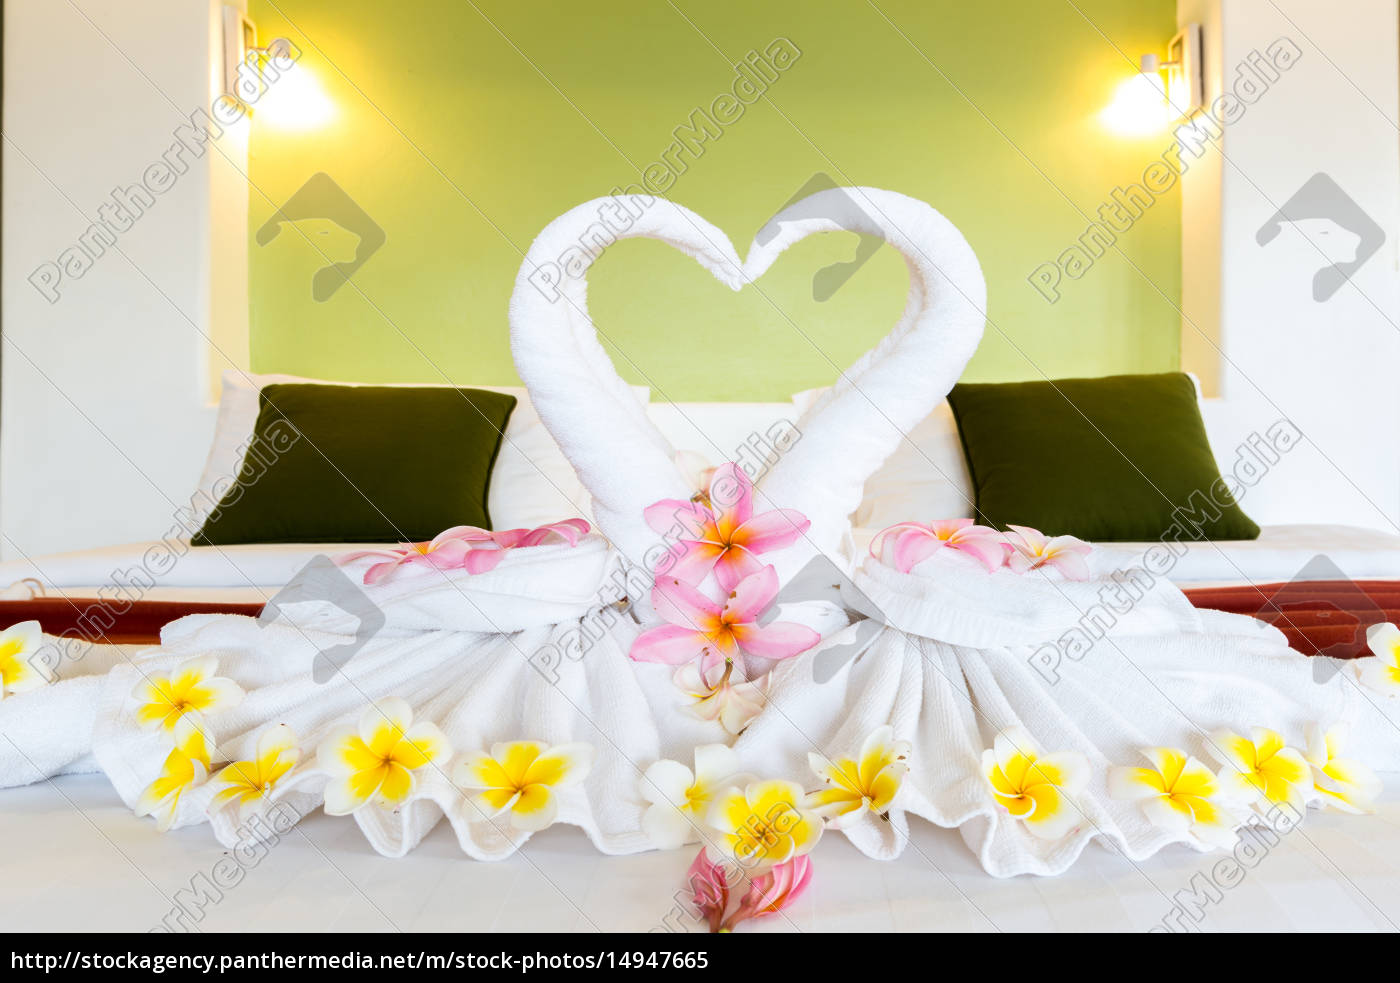 white, towel, decoration - 14947665